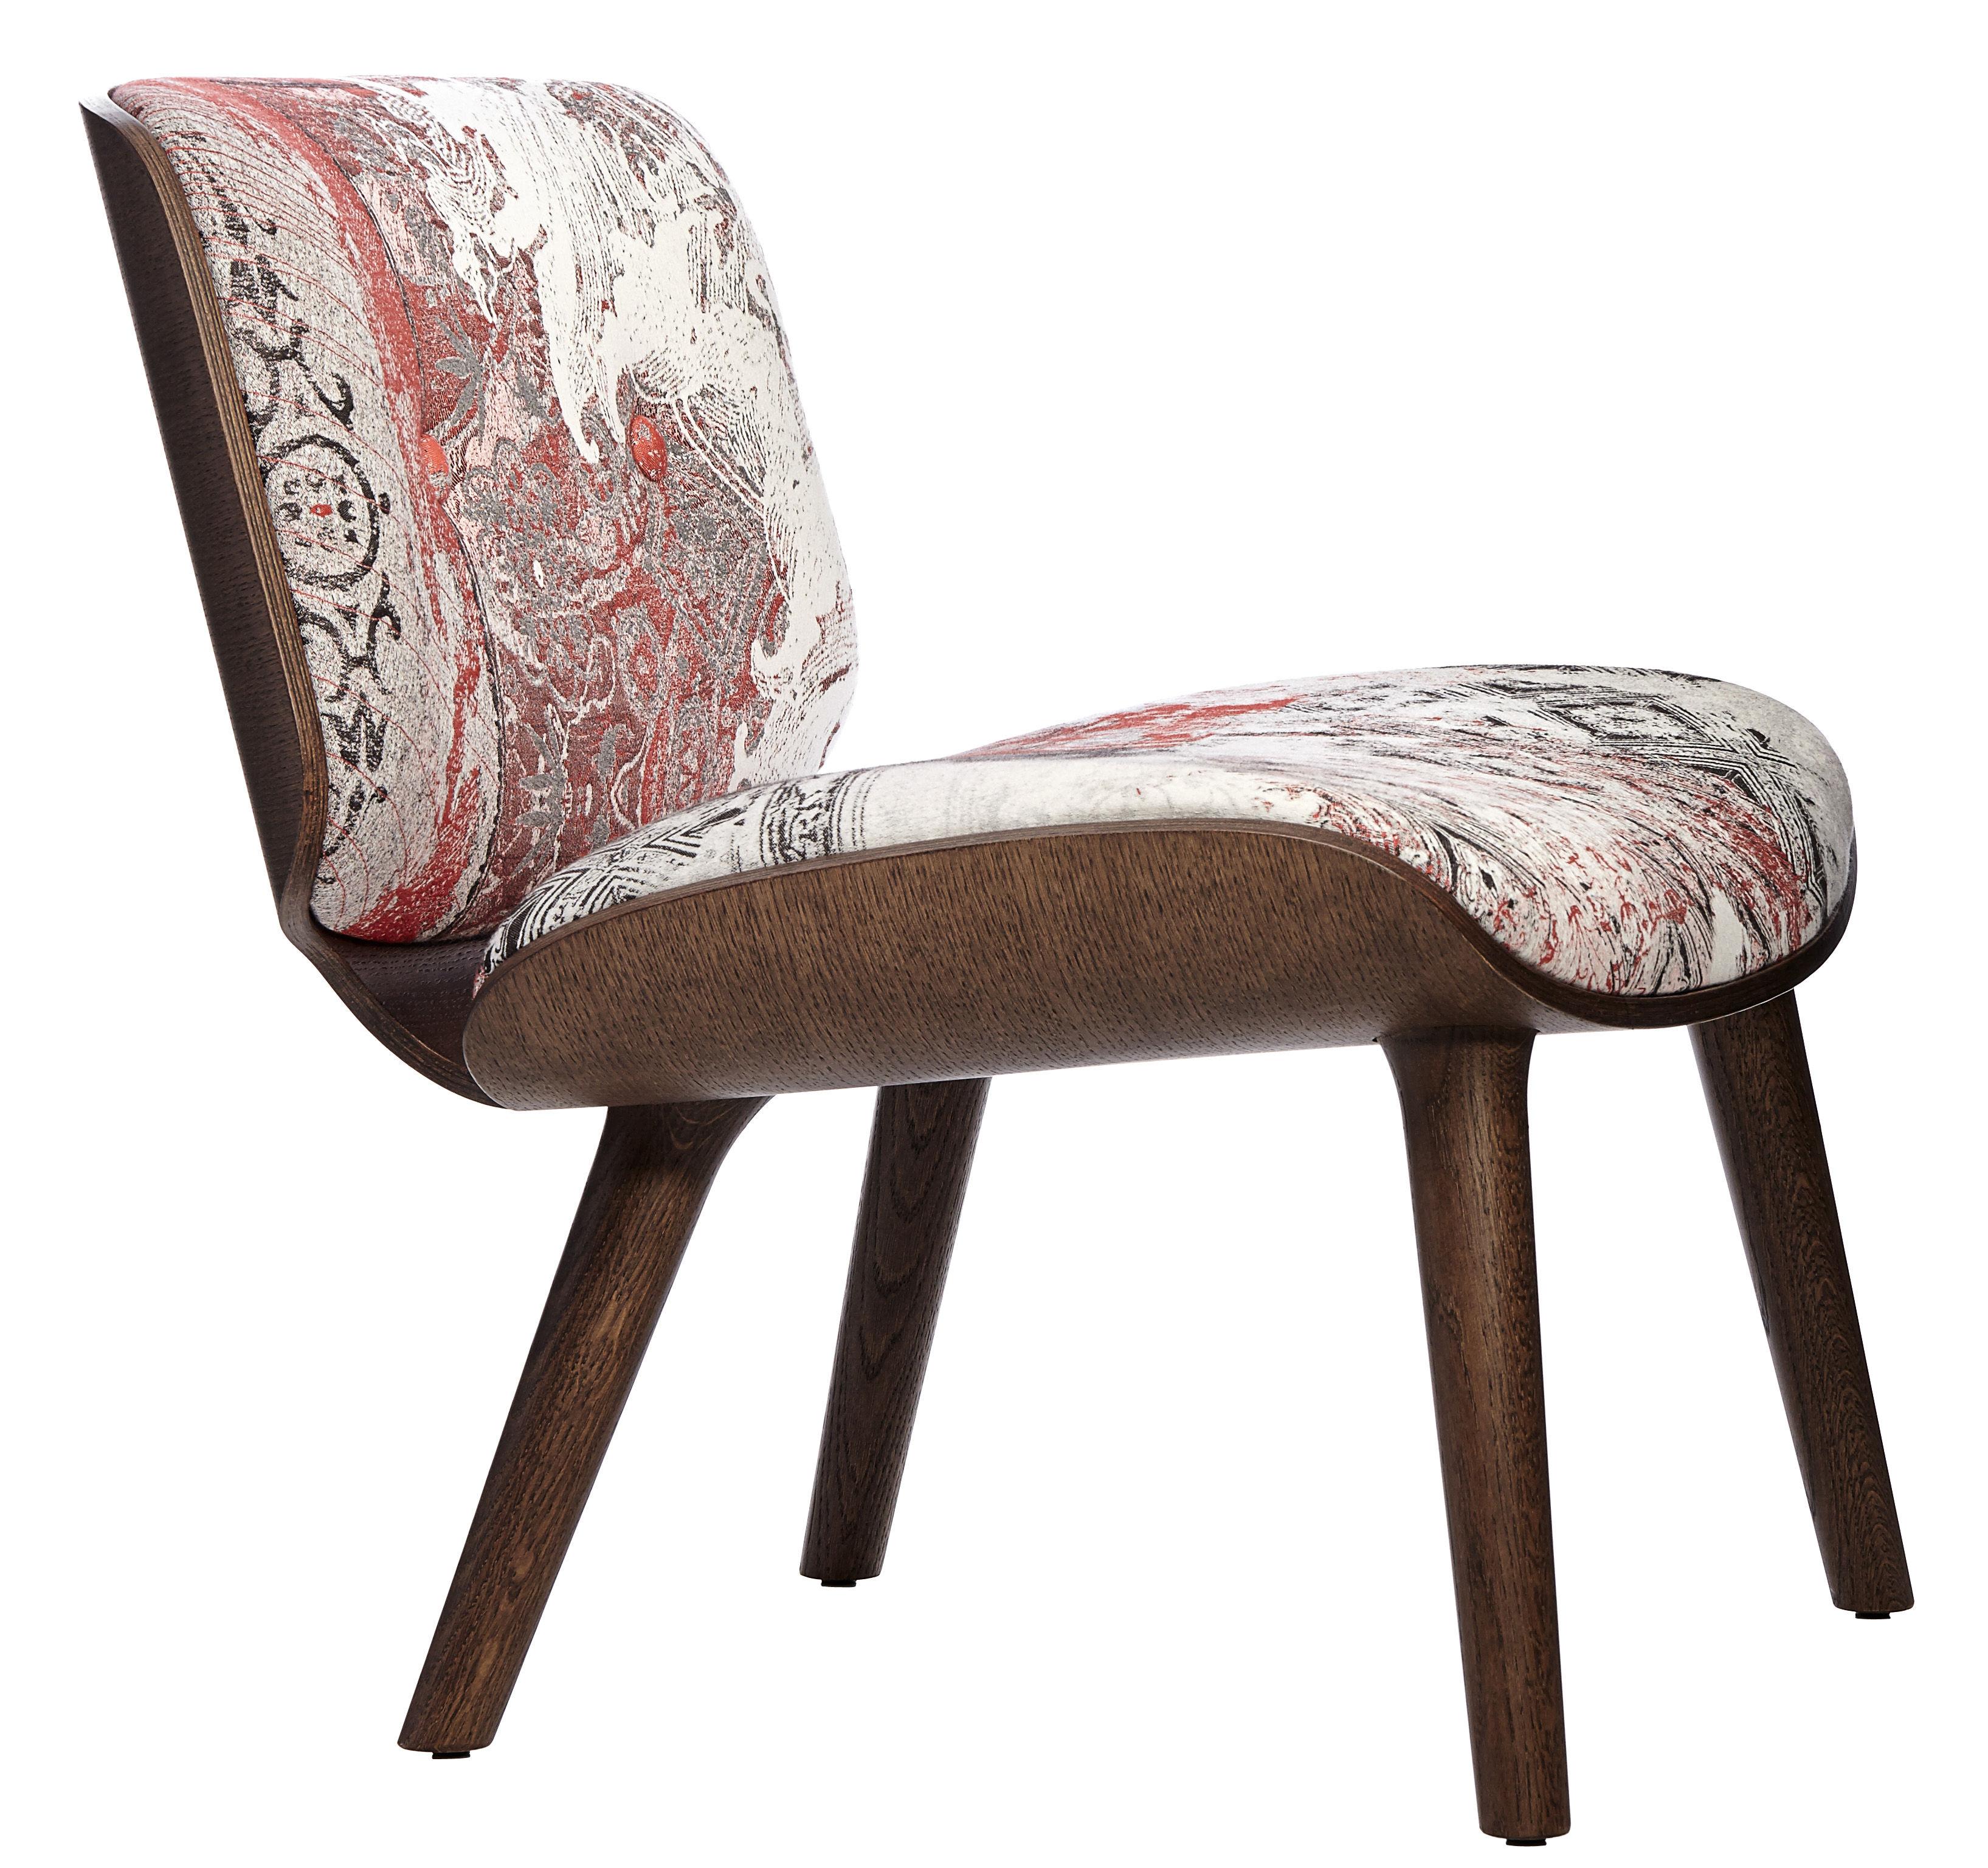 Möbel - Lounge Sessel - Nut Lounge Lounge Sessel / gepolstert - Moooi - Rottöne / Gestell: Holz, zimtfarben - Eichenholzfurnier, Gewebe, massive Eiche, Schaumstoff